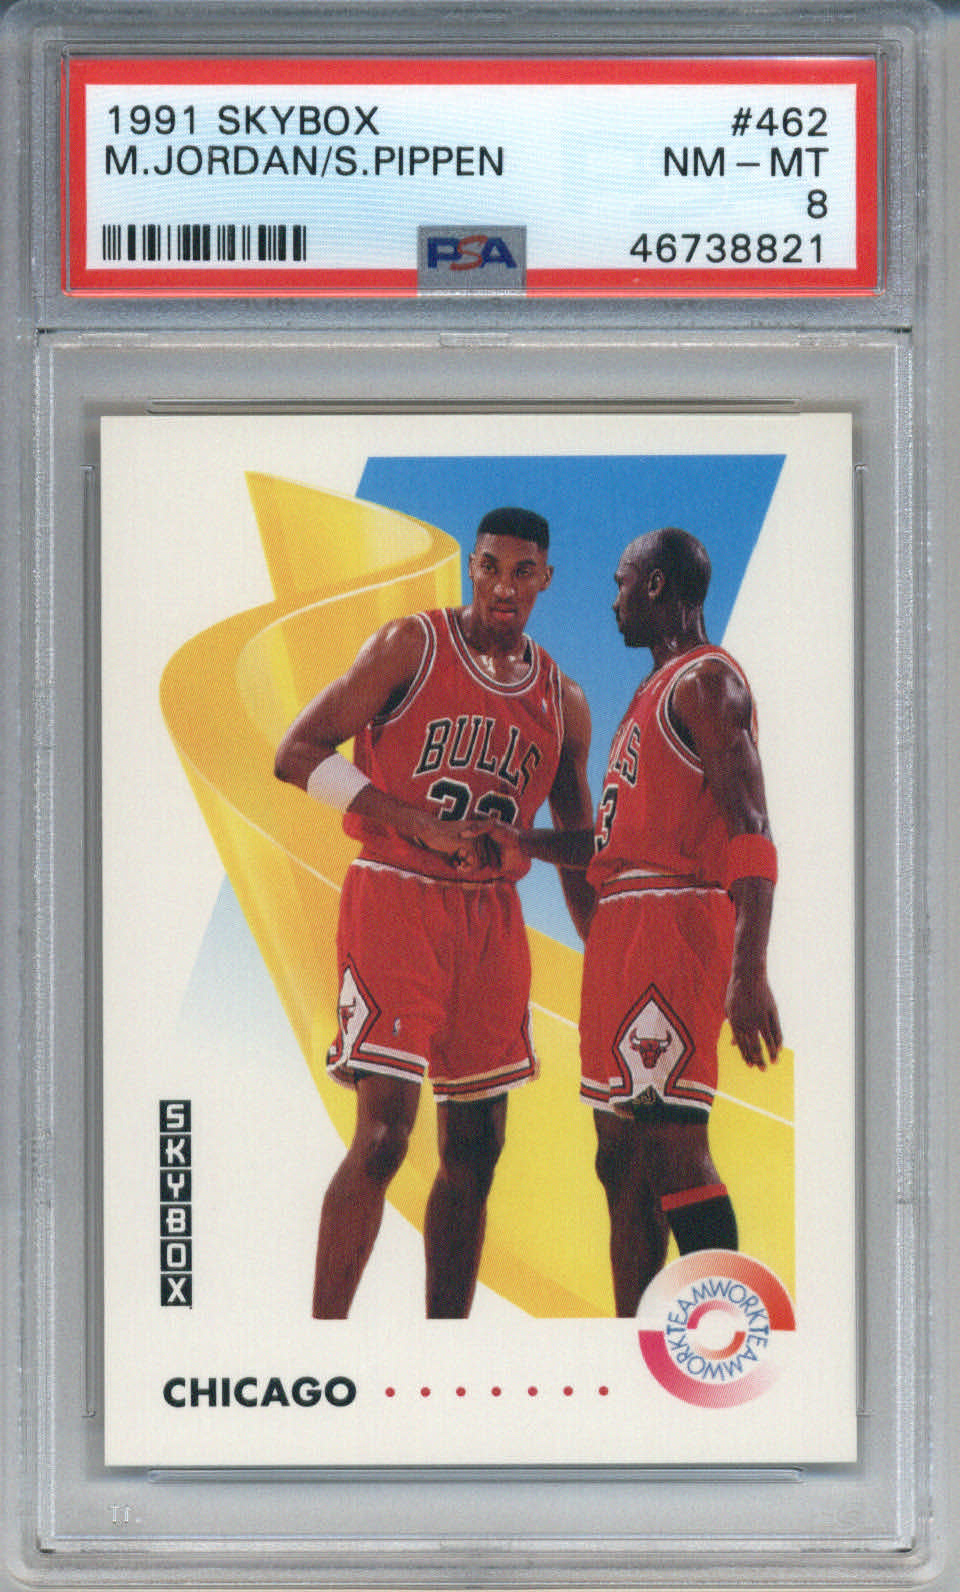 1991 Skybox #462 Michael Jordan/Scottie Pippen PSA 8